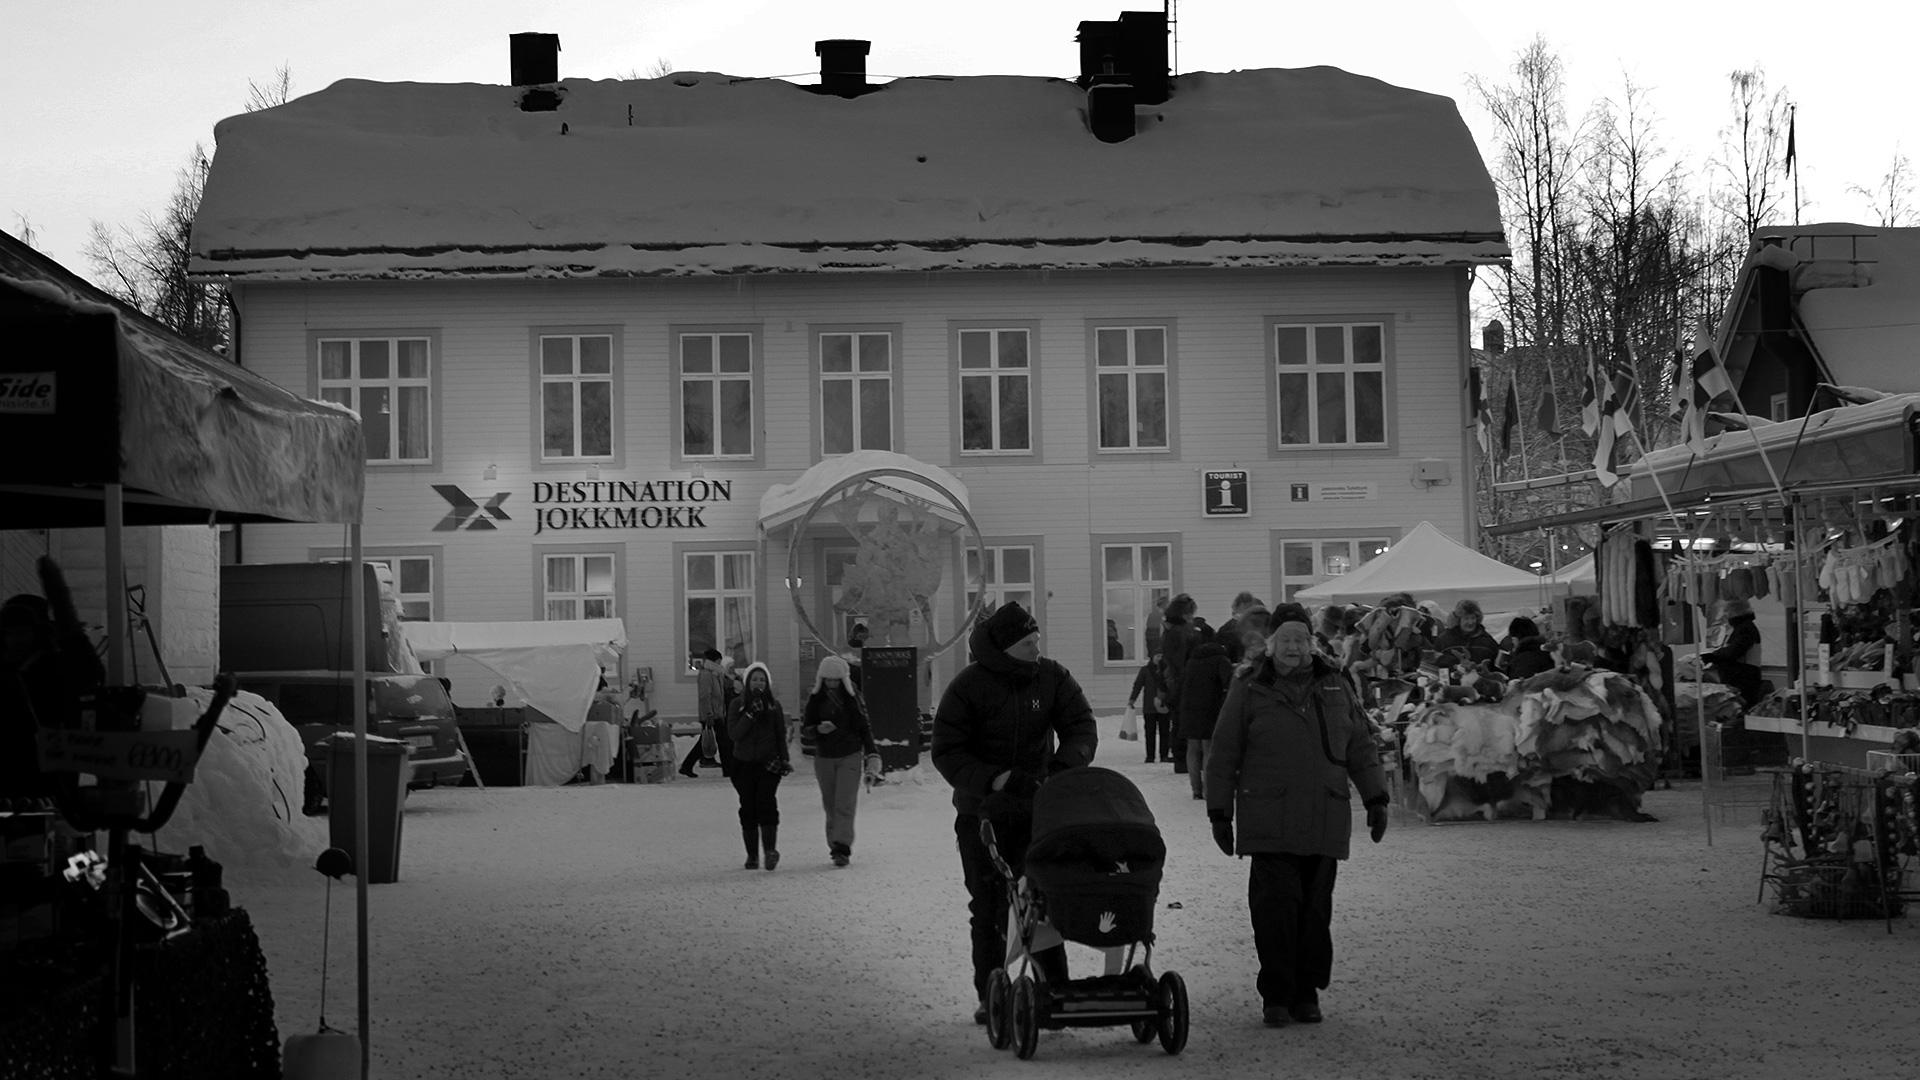 2016-02-04 - Destination Jokkmokk and the tourist information (black & white)